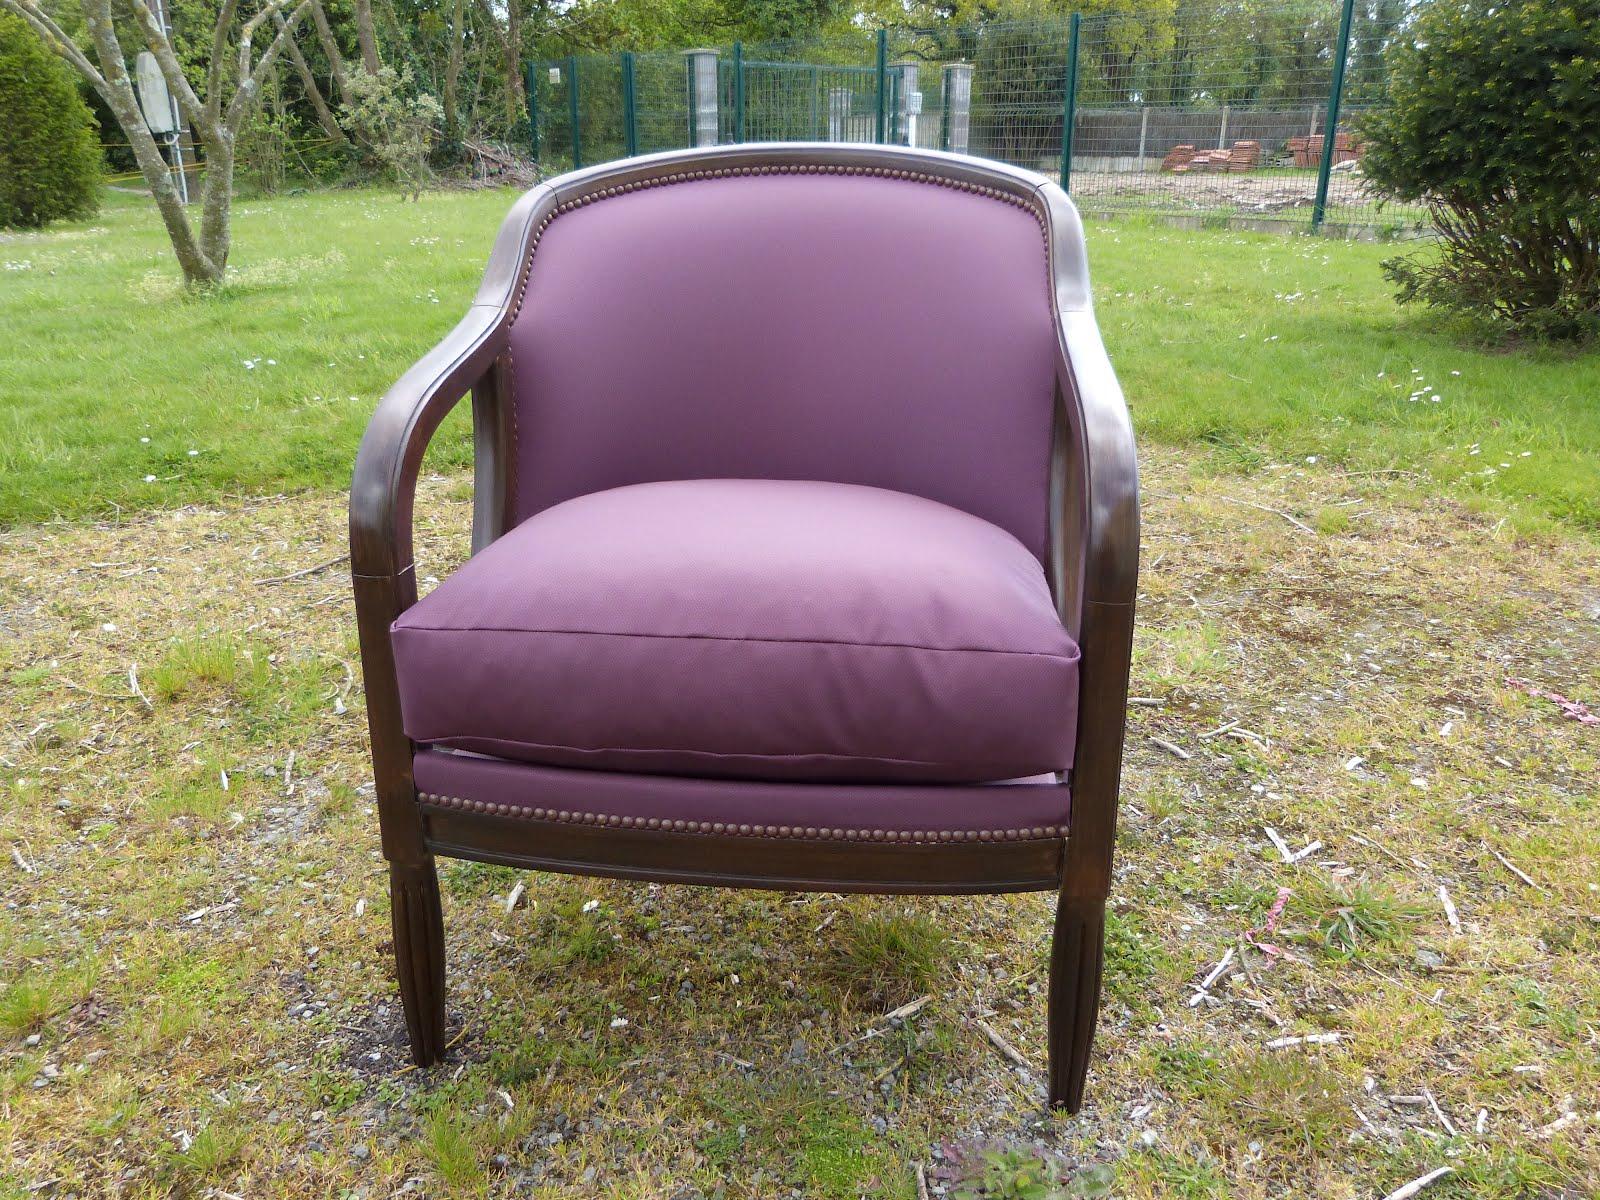 49 fauteuil tonneau en simili cuir les jolis si ges. Black Bedroom Furniture Sets. Home Design Ideas